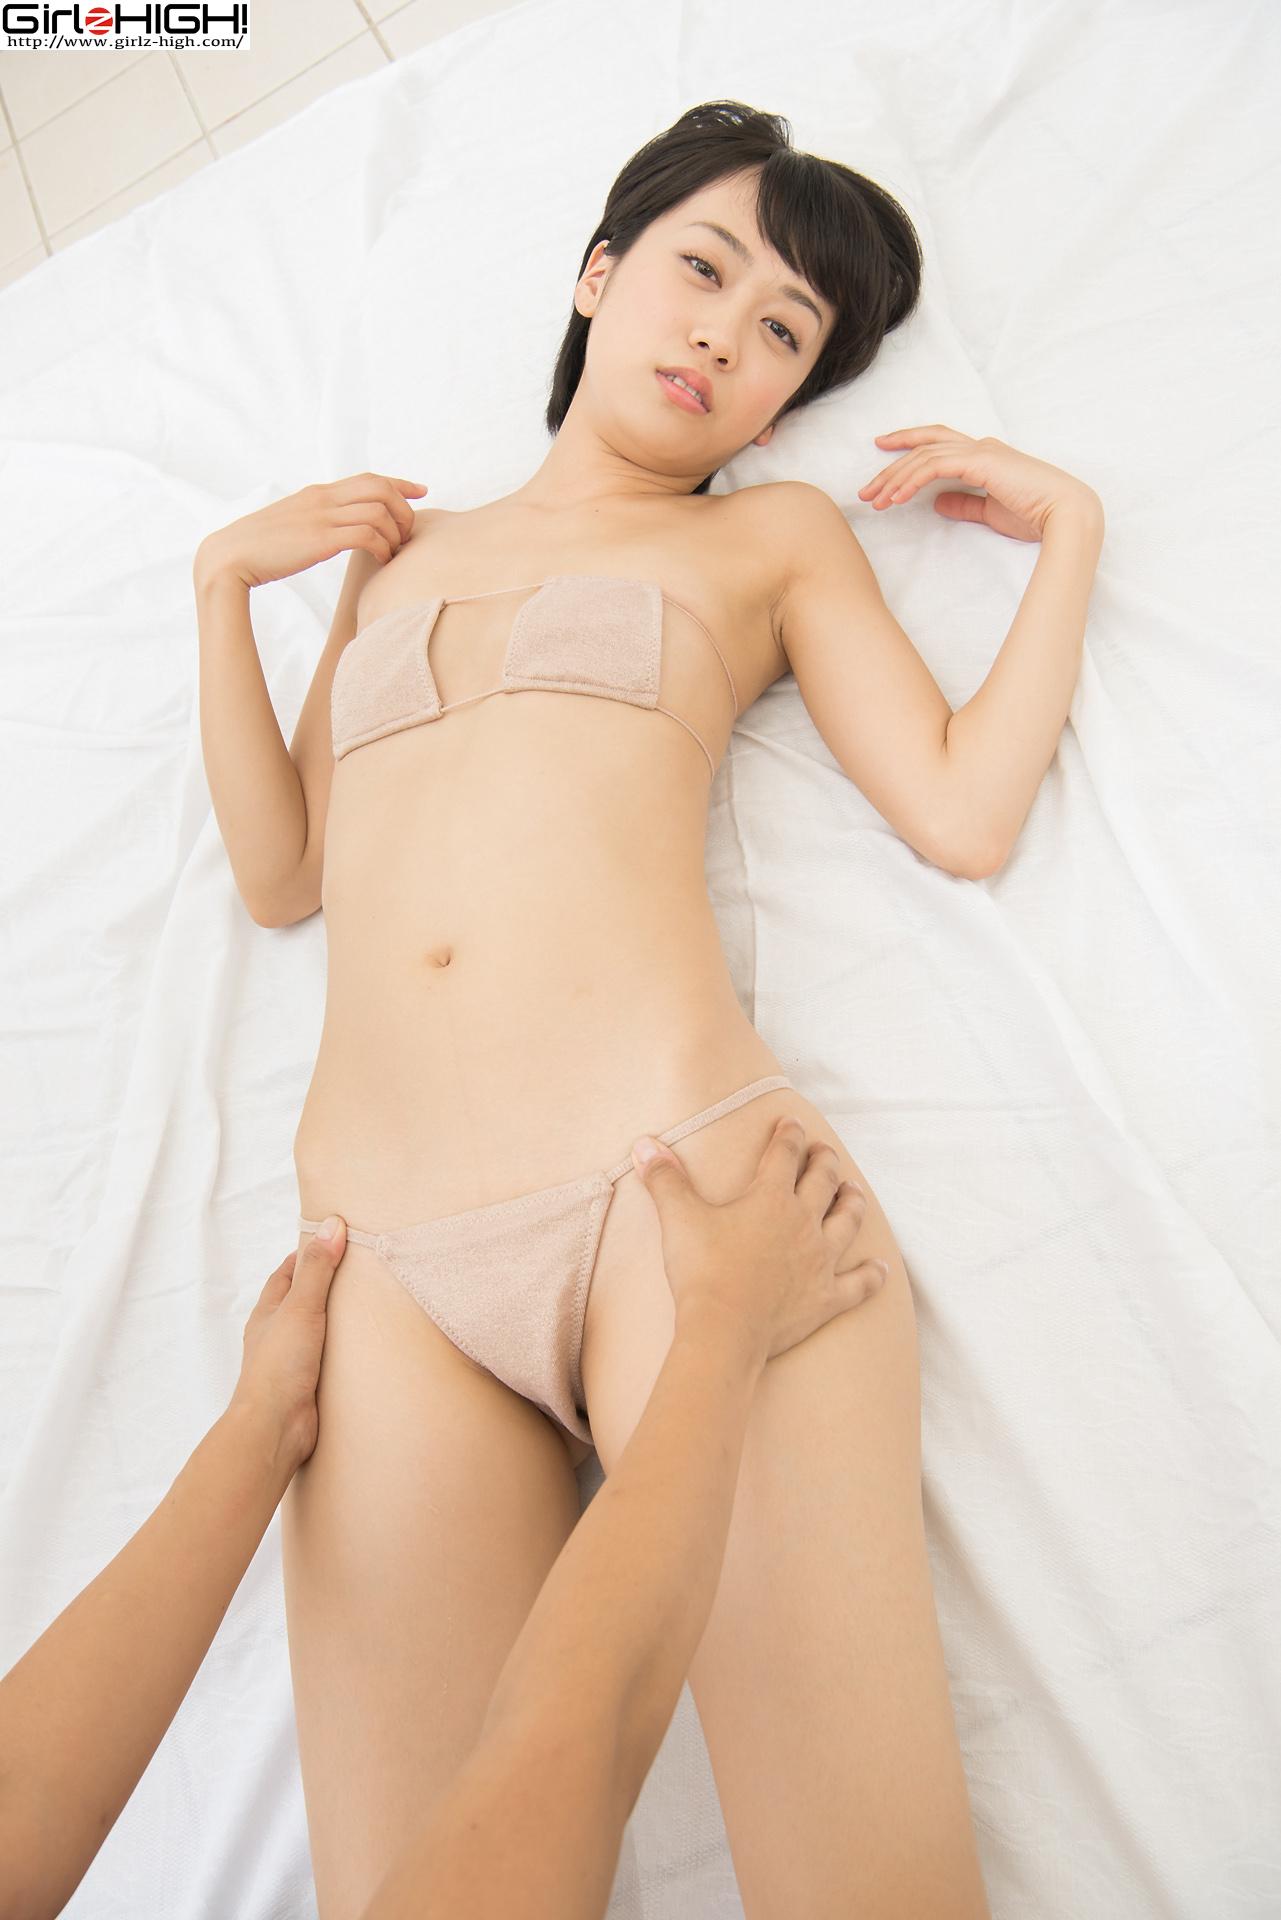 bkoh_011_002a-jpg [Girlz-High] 2017-07-28 Koharu Nishino - bkoh_011_002 [31.9 Mb] 09120